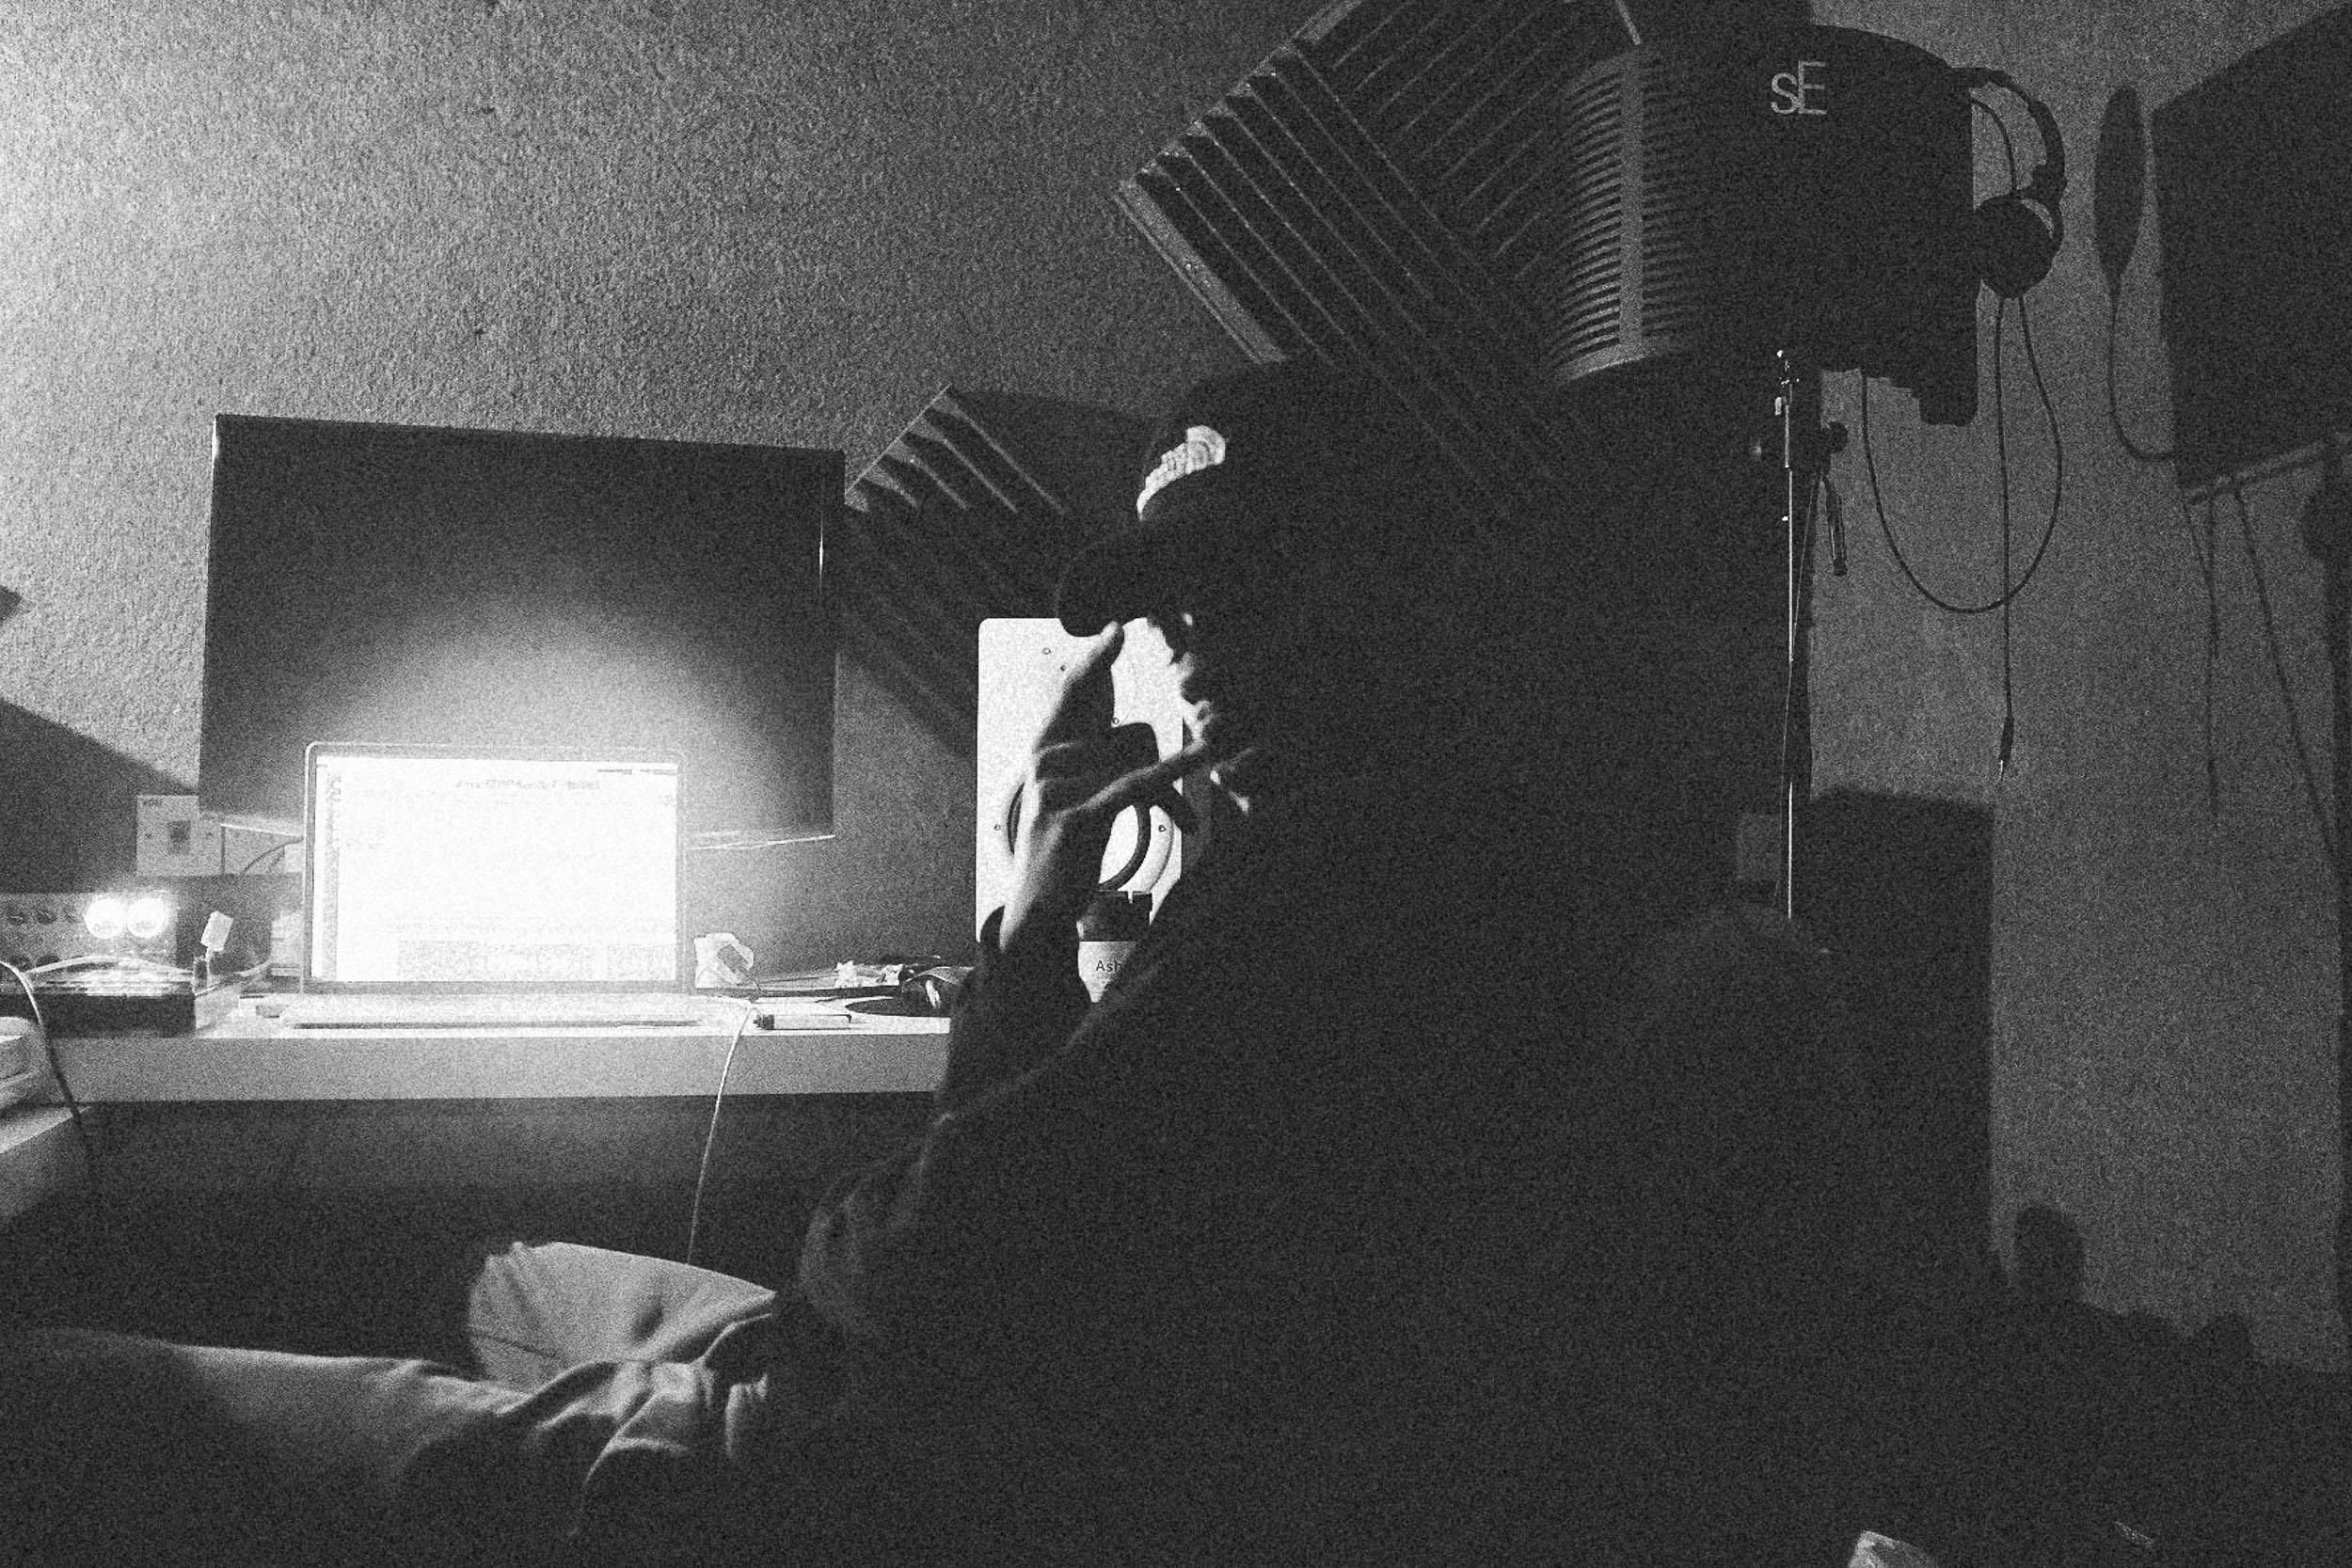 film-archive-kc.locke-60.jpg